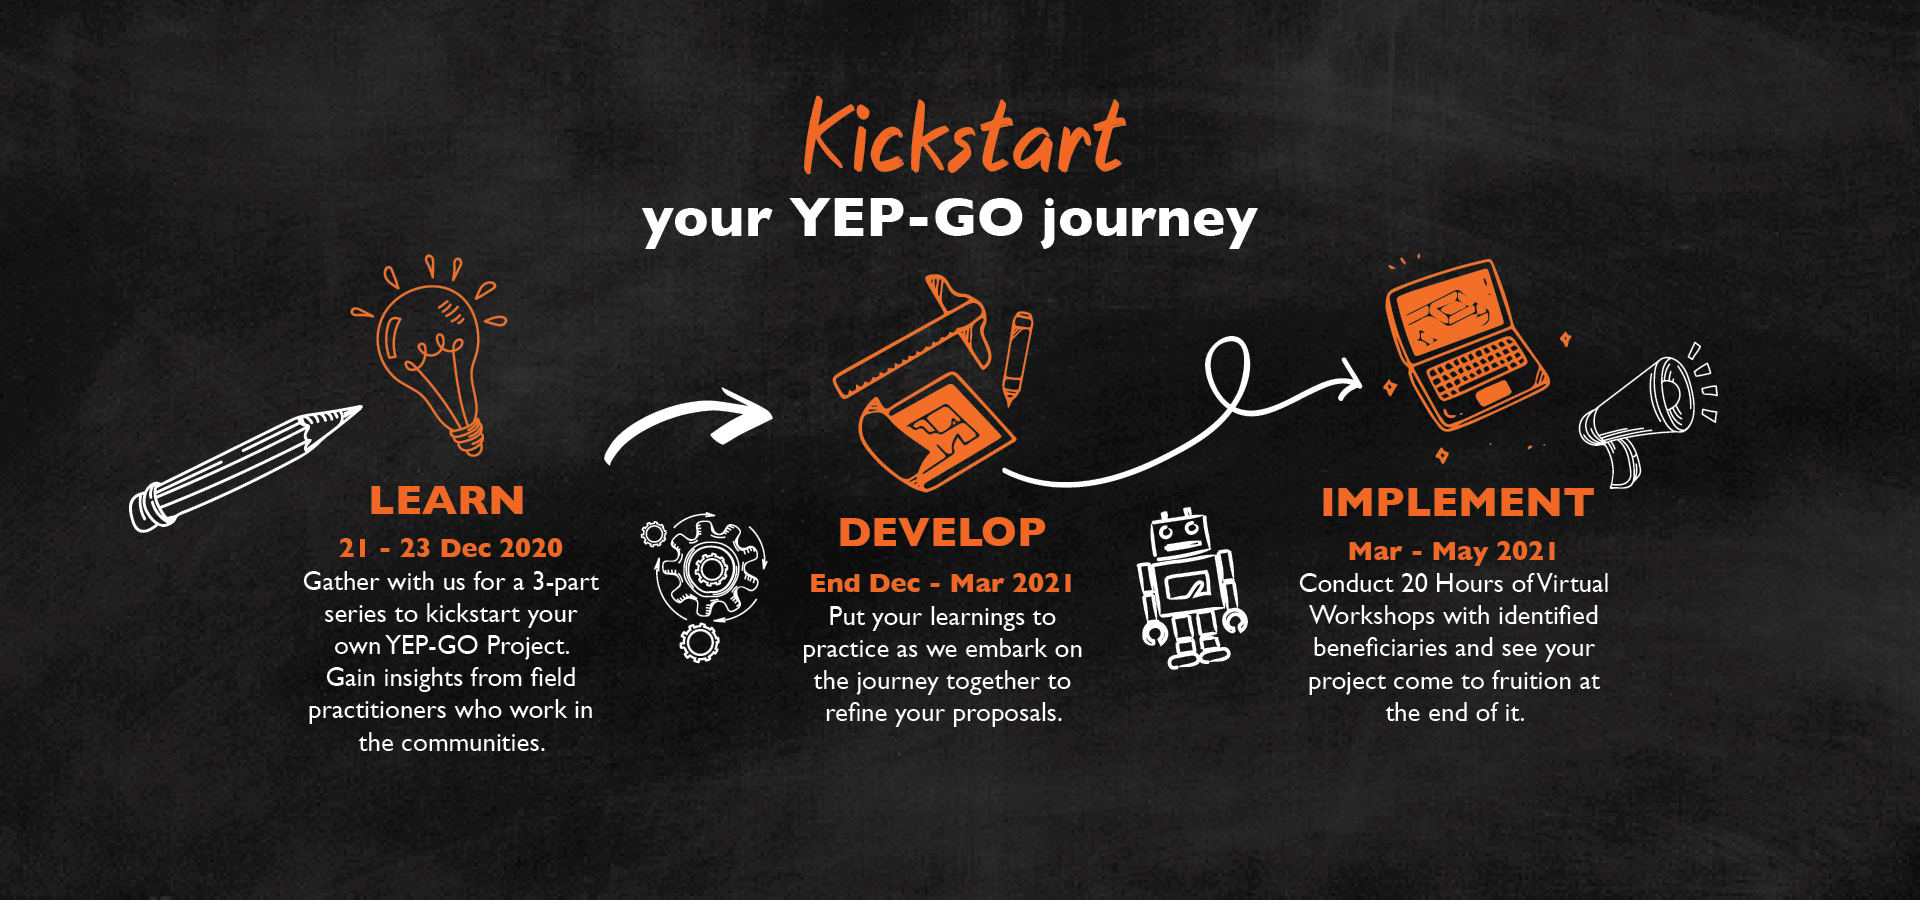 yep-go journey-2